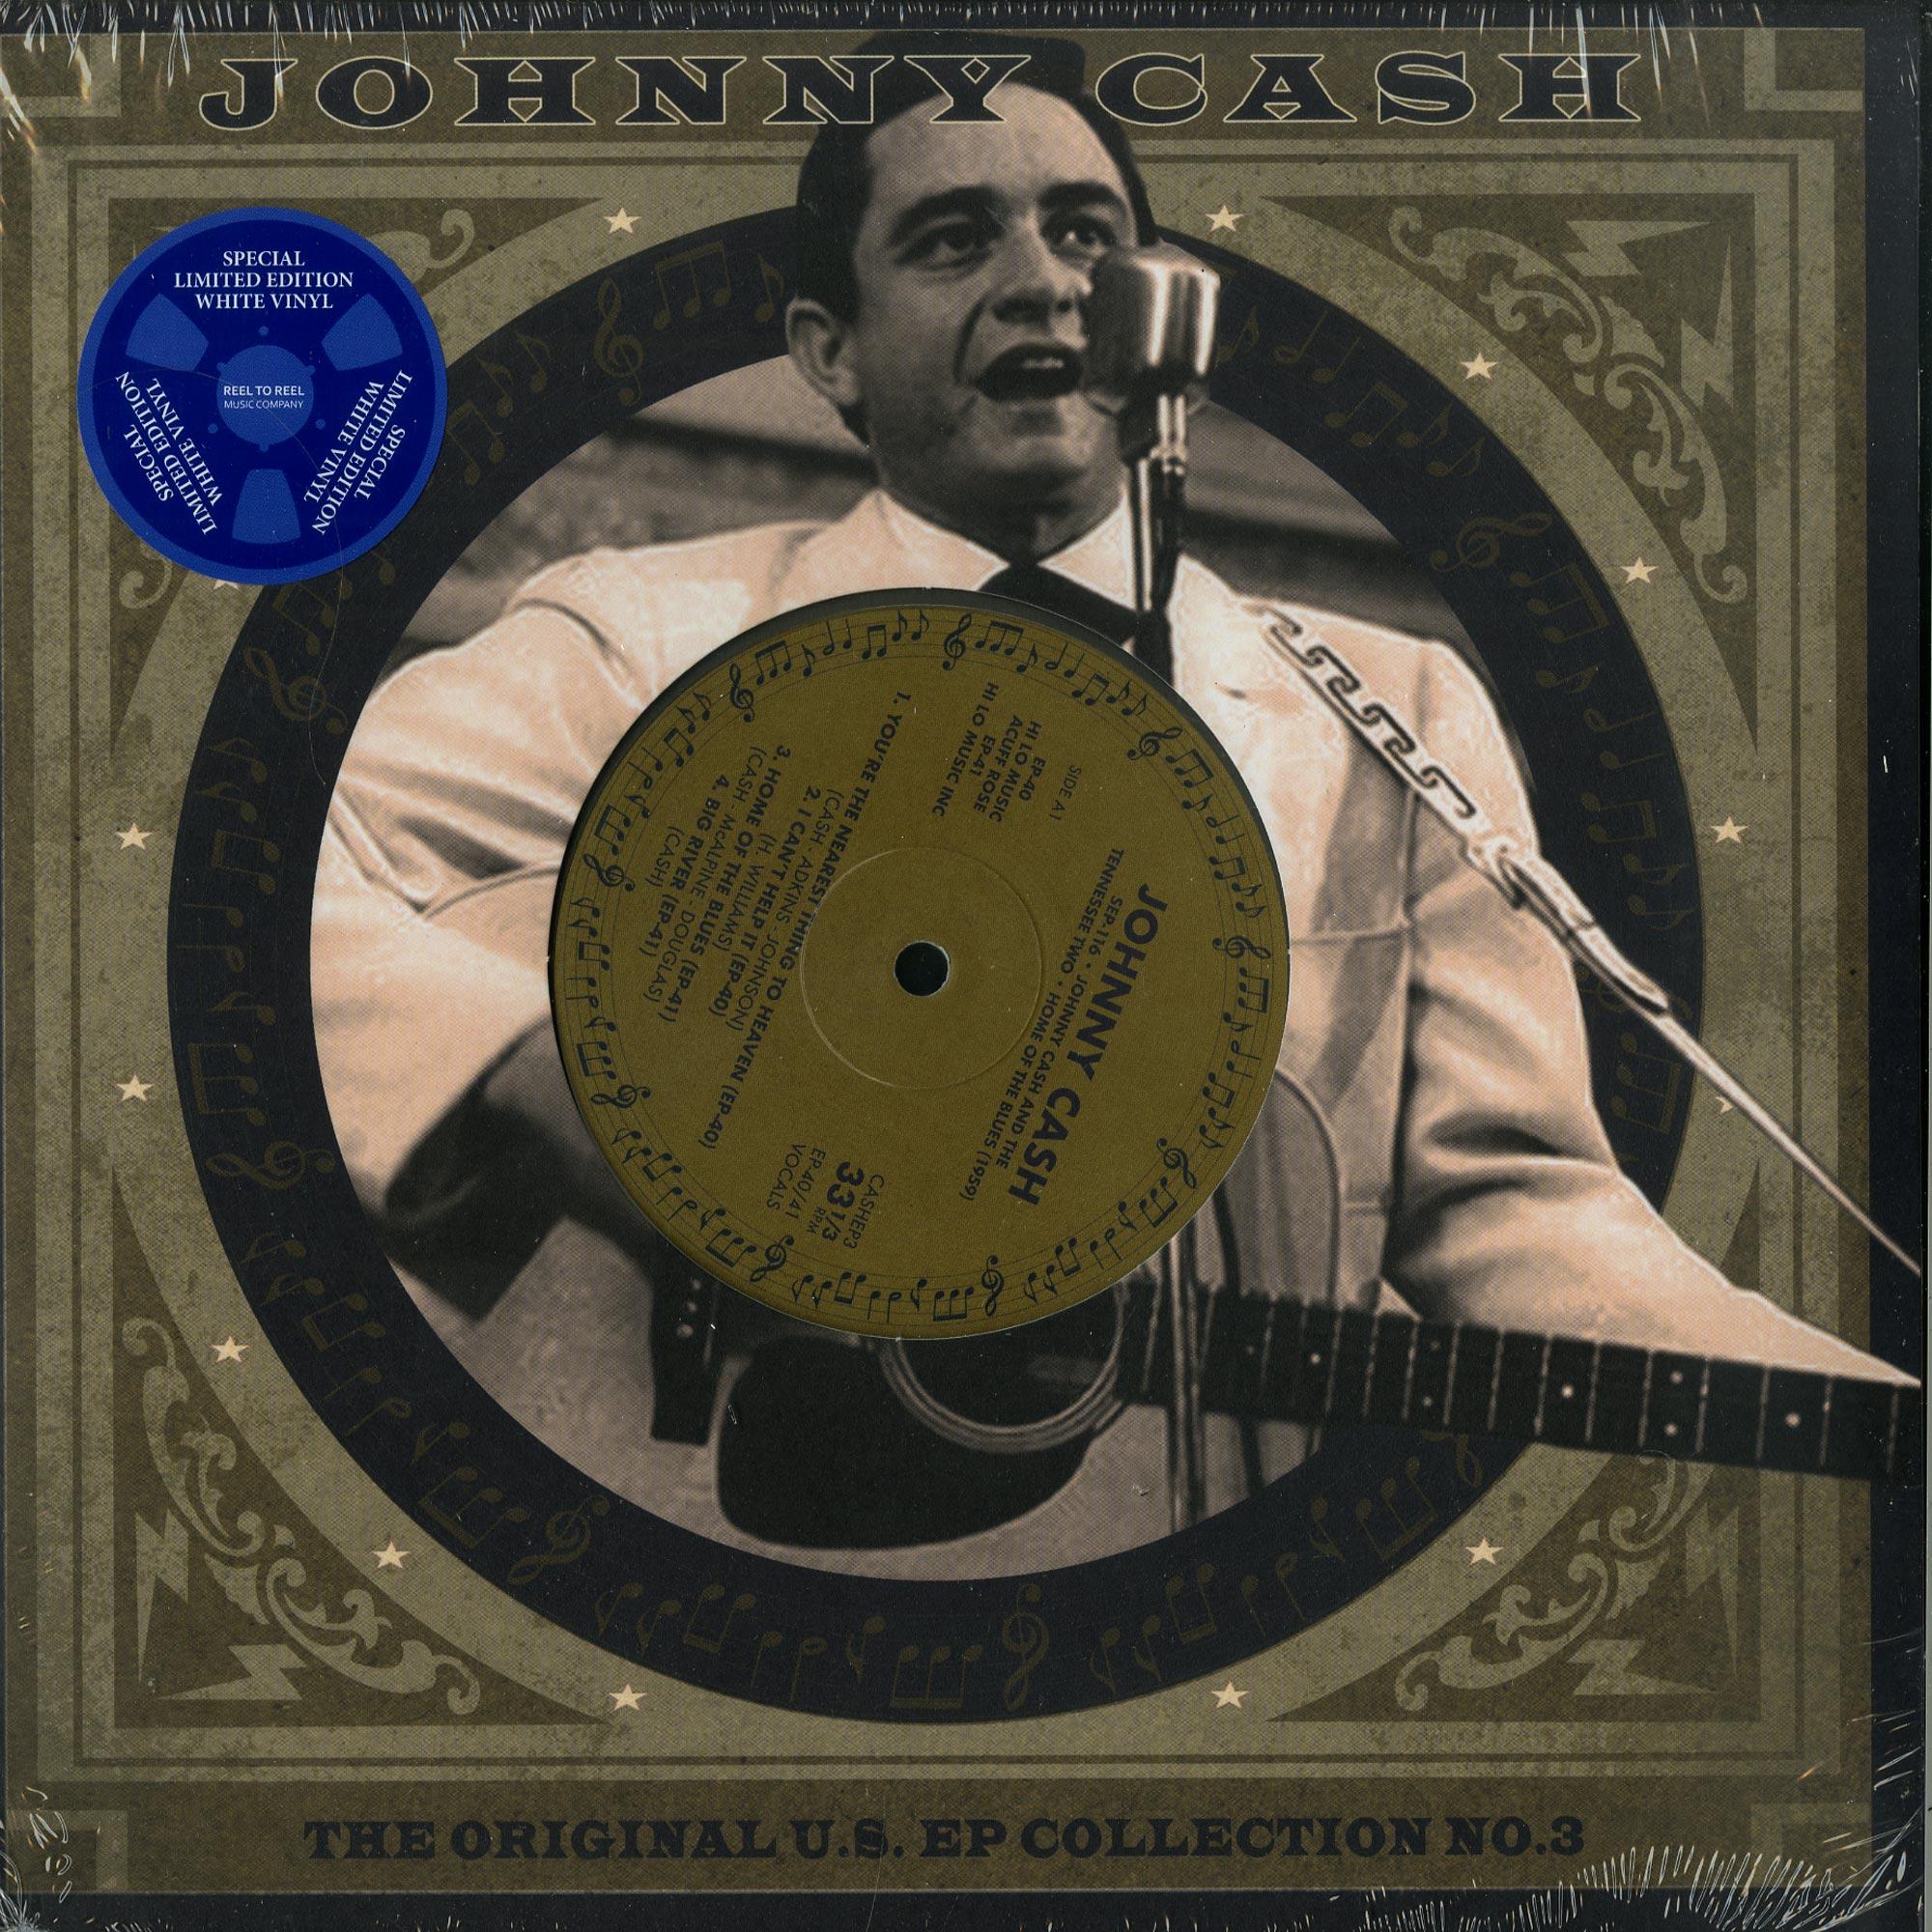 Johnny Cash - THE ORIGINAL U.S. EP COLLECTION VOL. 3